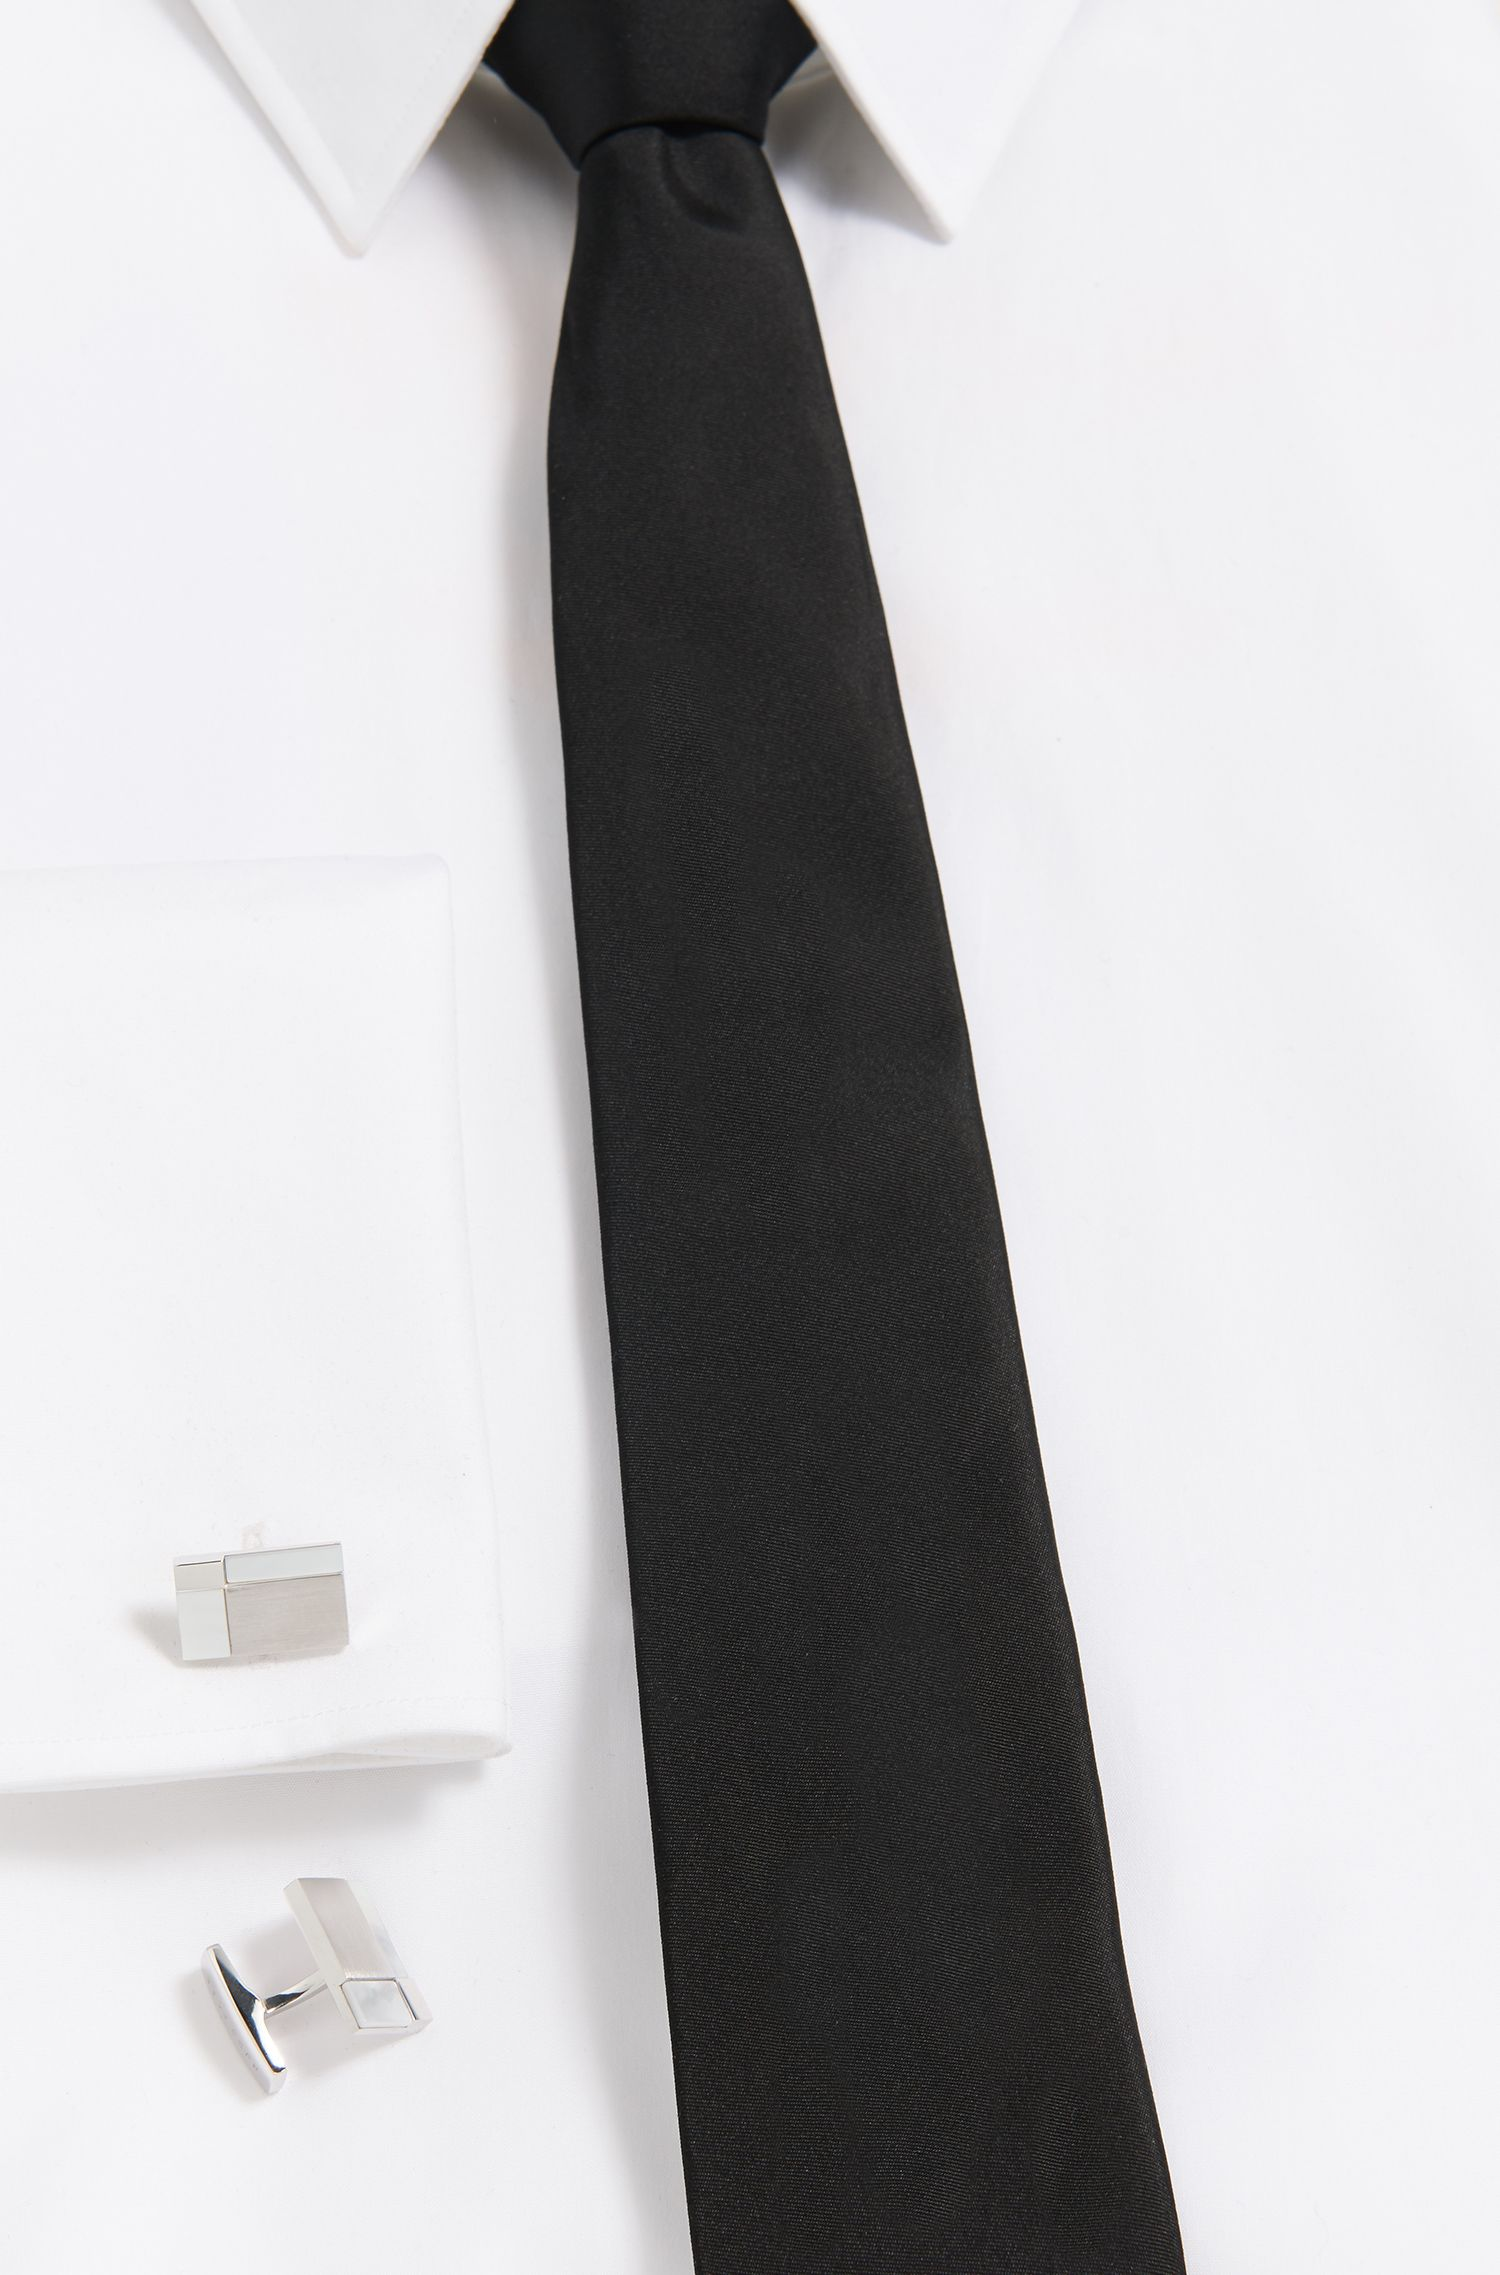 White Onyx & Metal Cufflinks | T-Clark, White